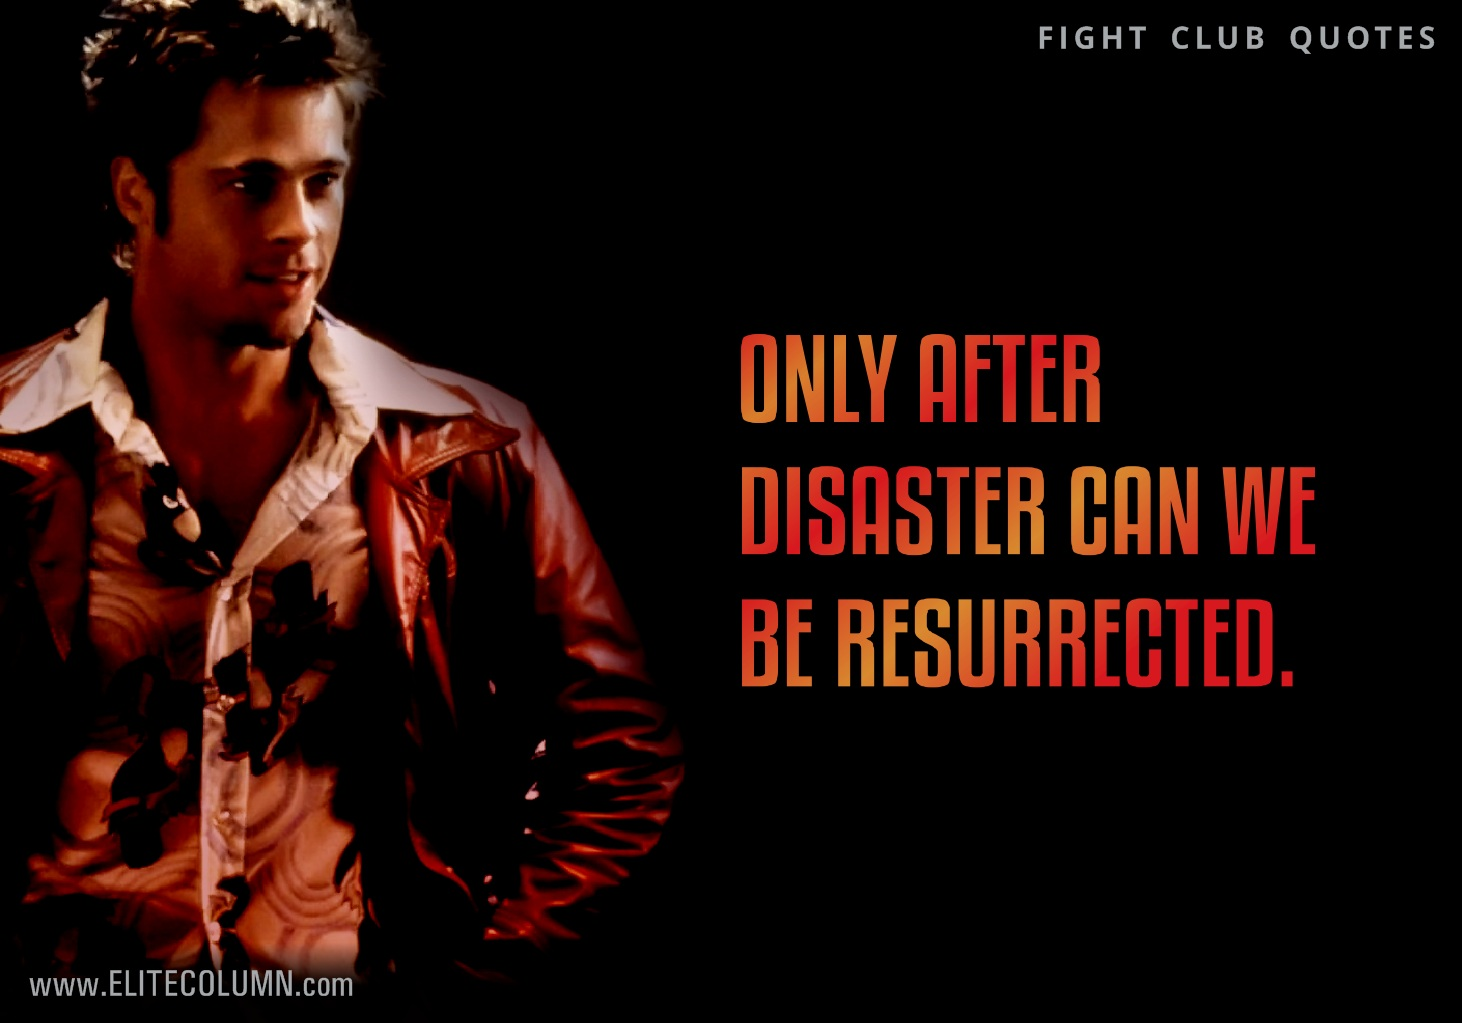 Fight Club Quotes (3)